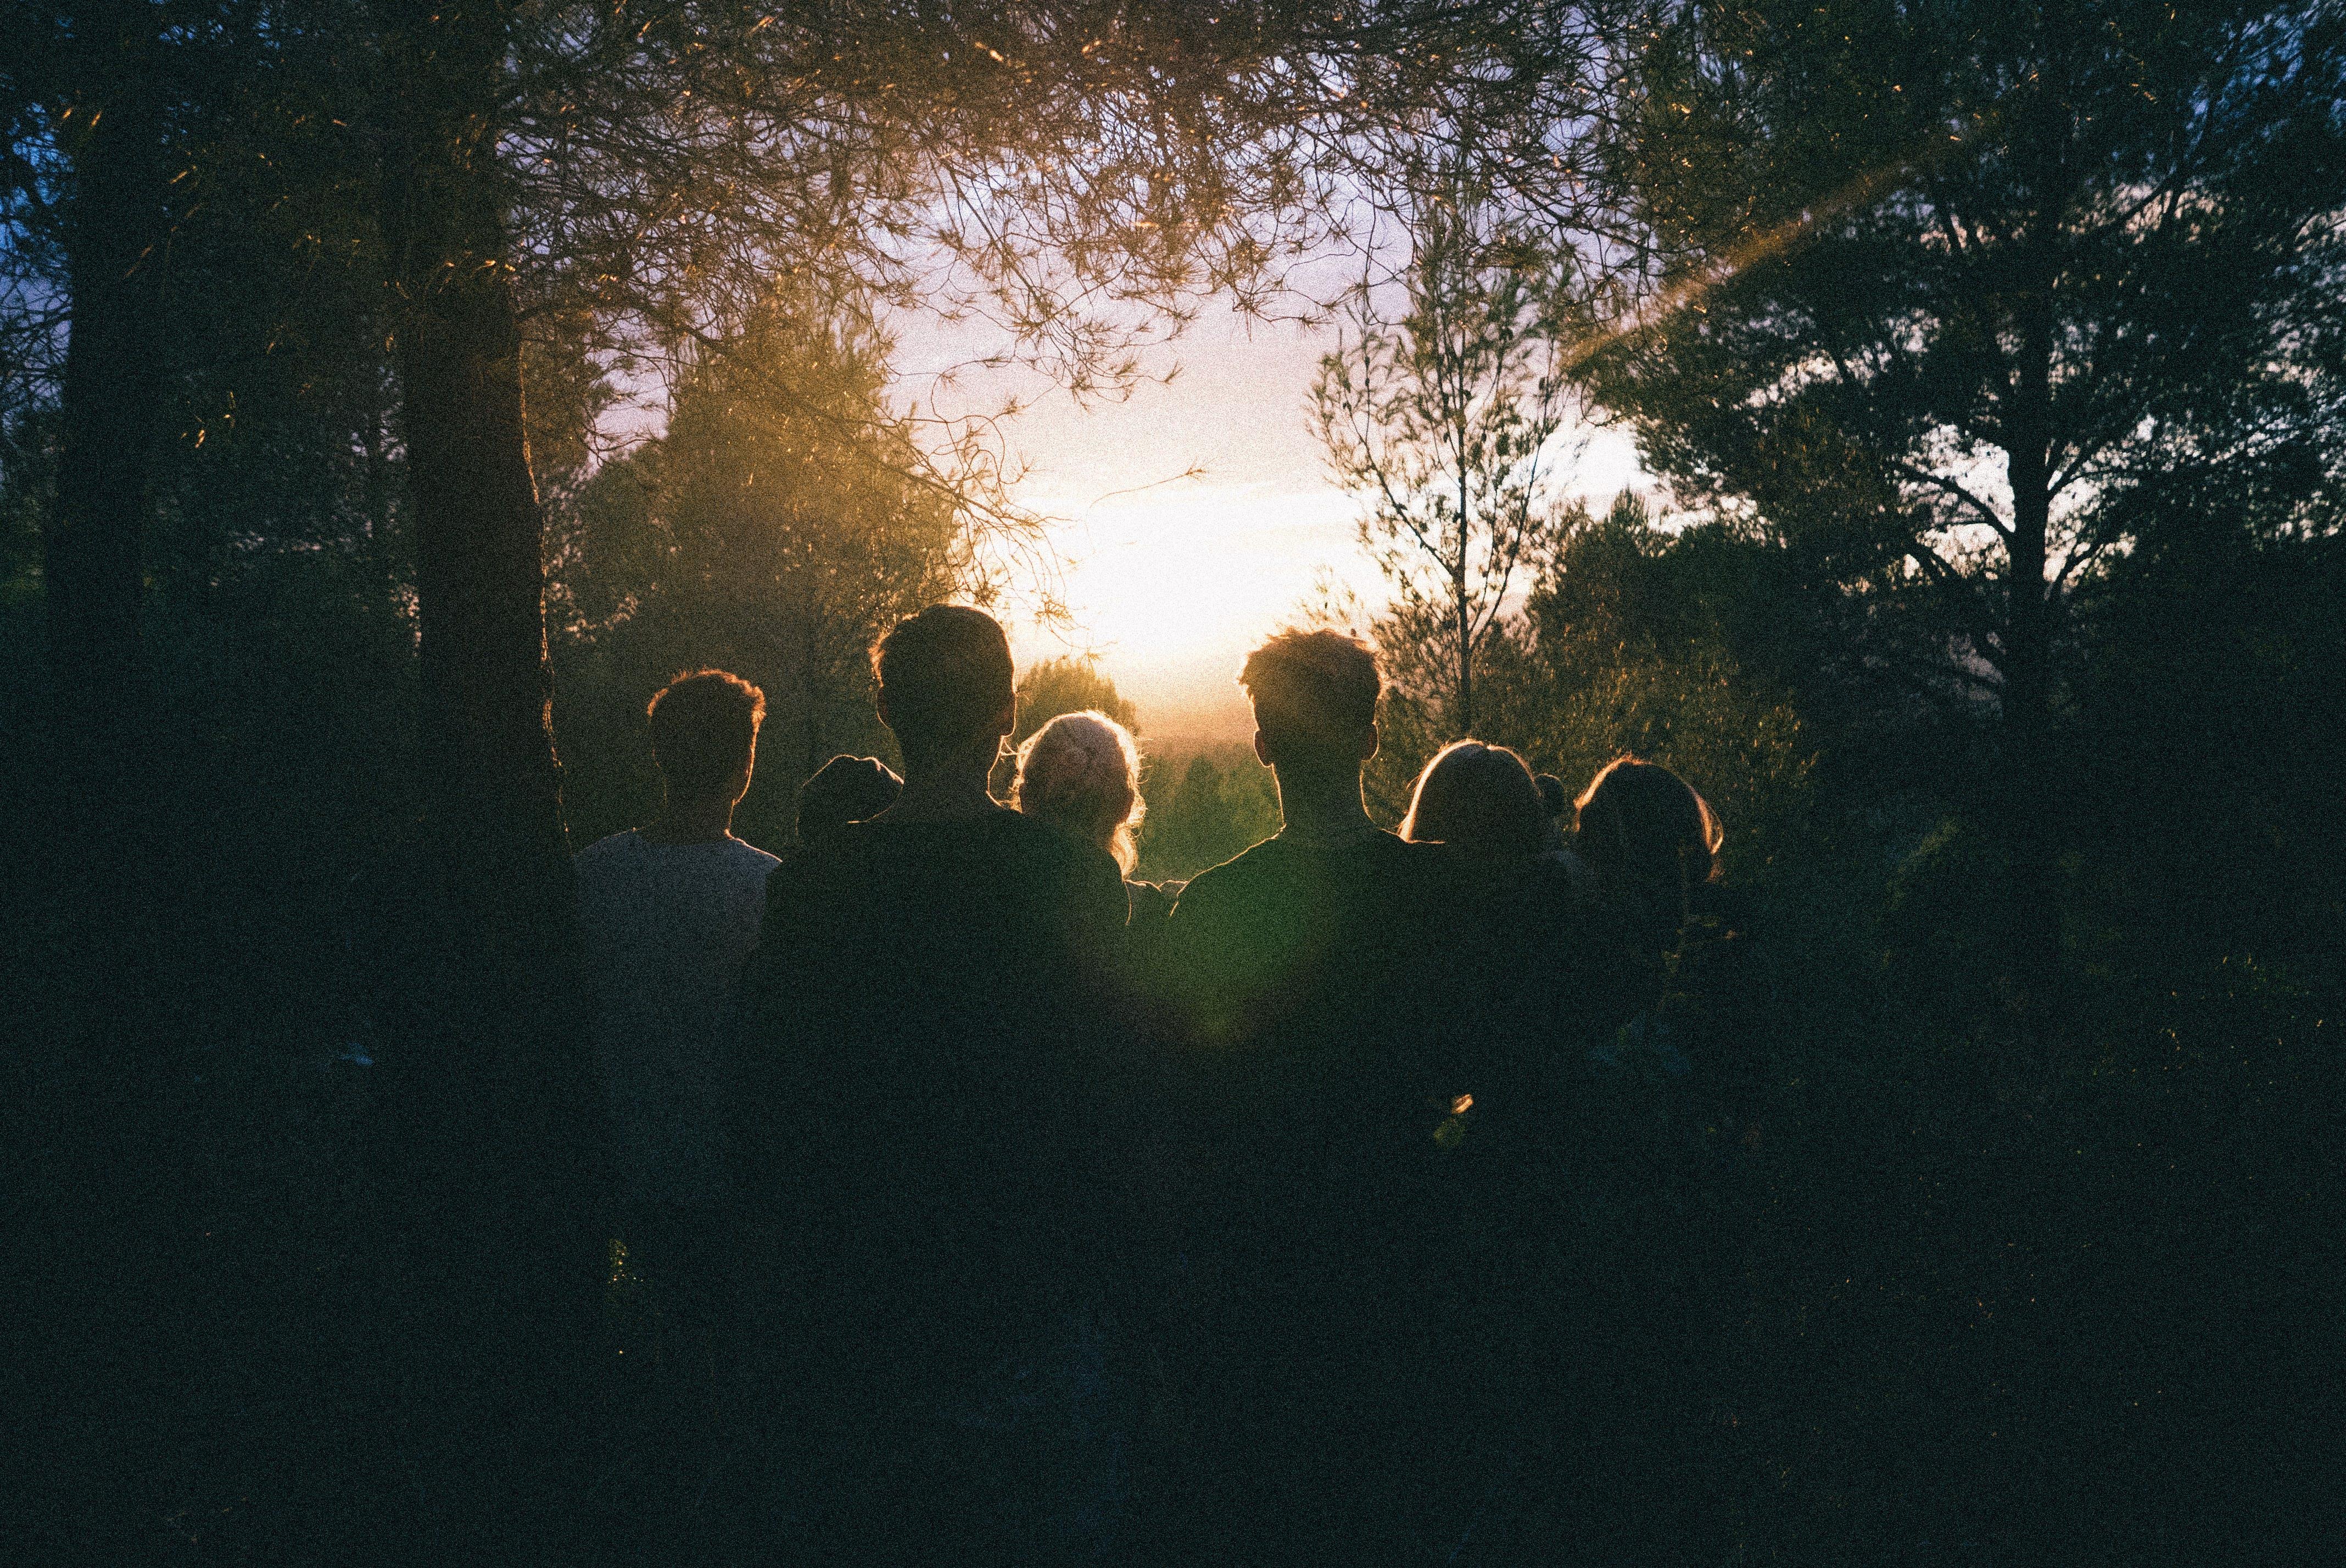 Silhouette of Group of People Between Tree Line